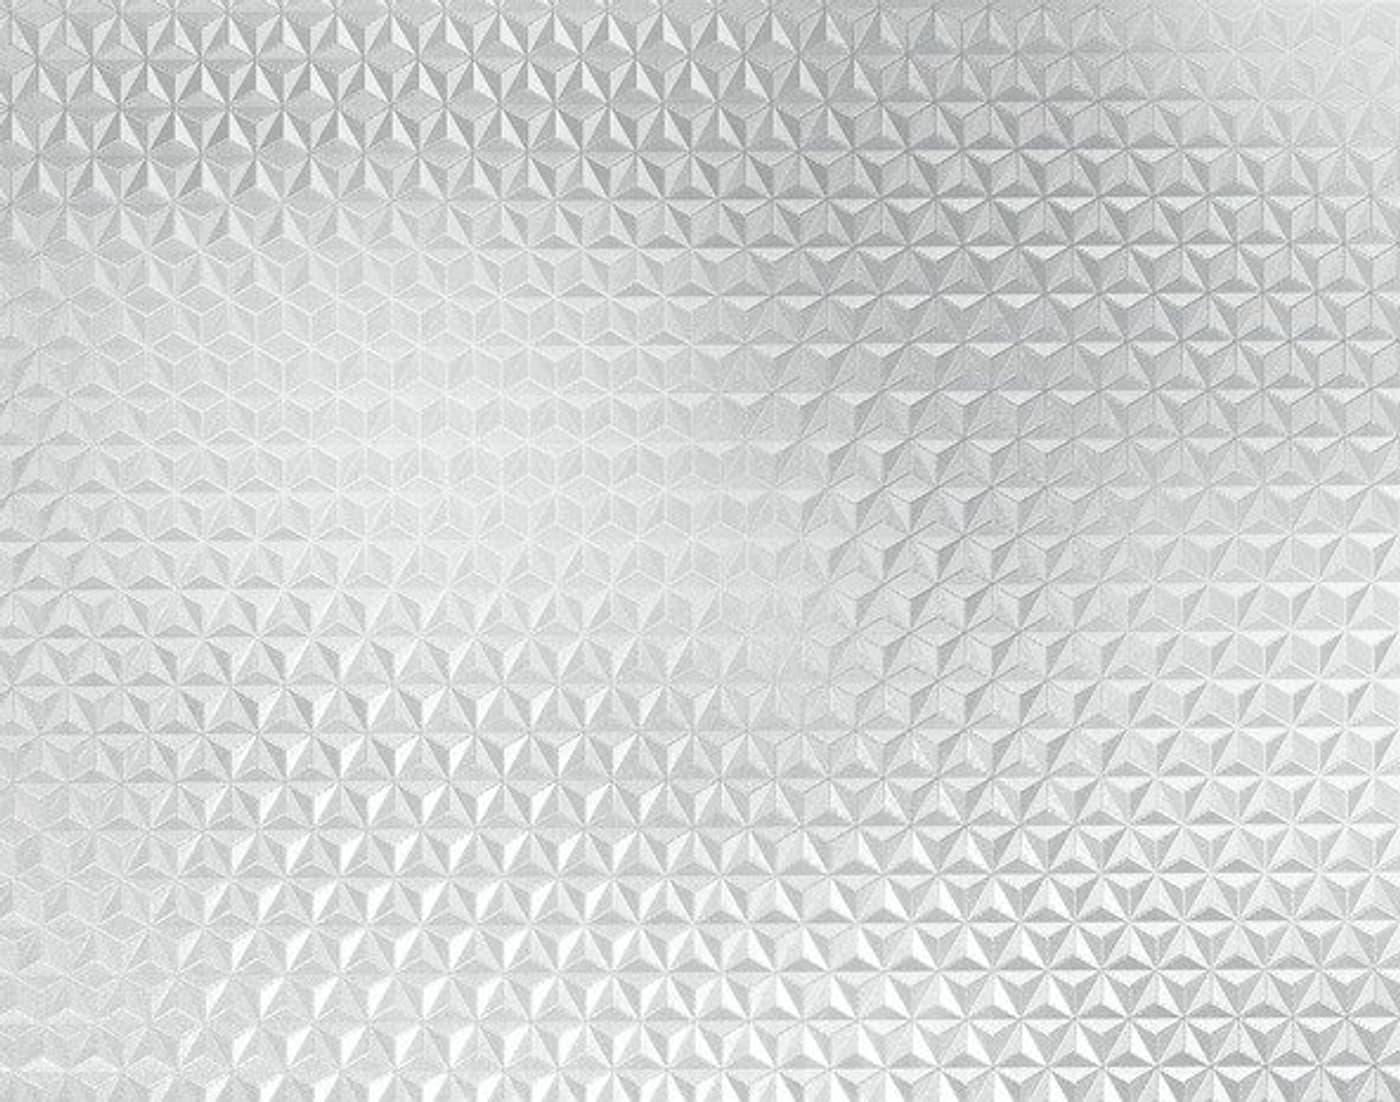 D c fix dekofolien selbstklebend steps gepr gt migros for Dekofolien selbstklebend